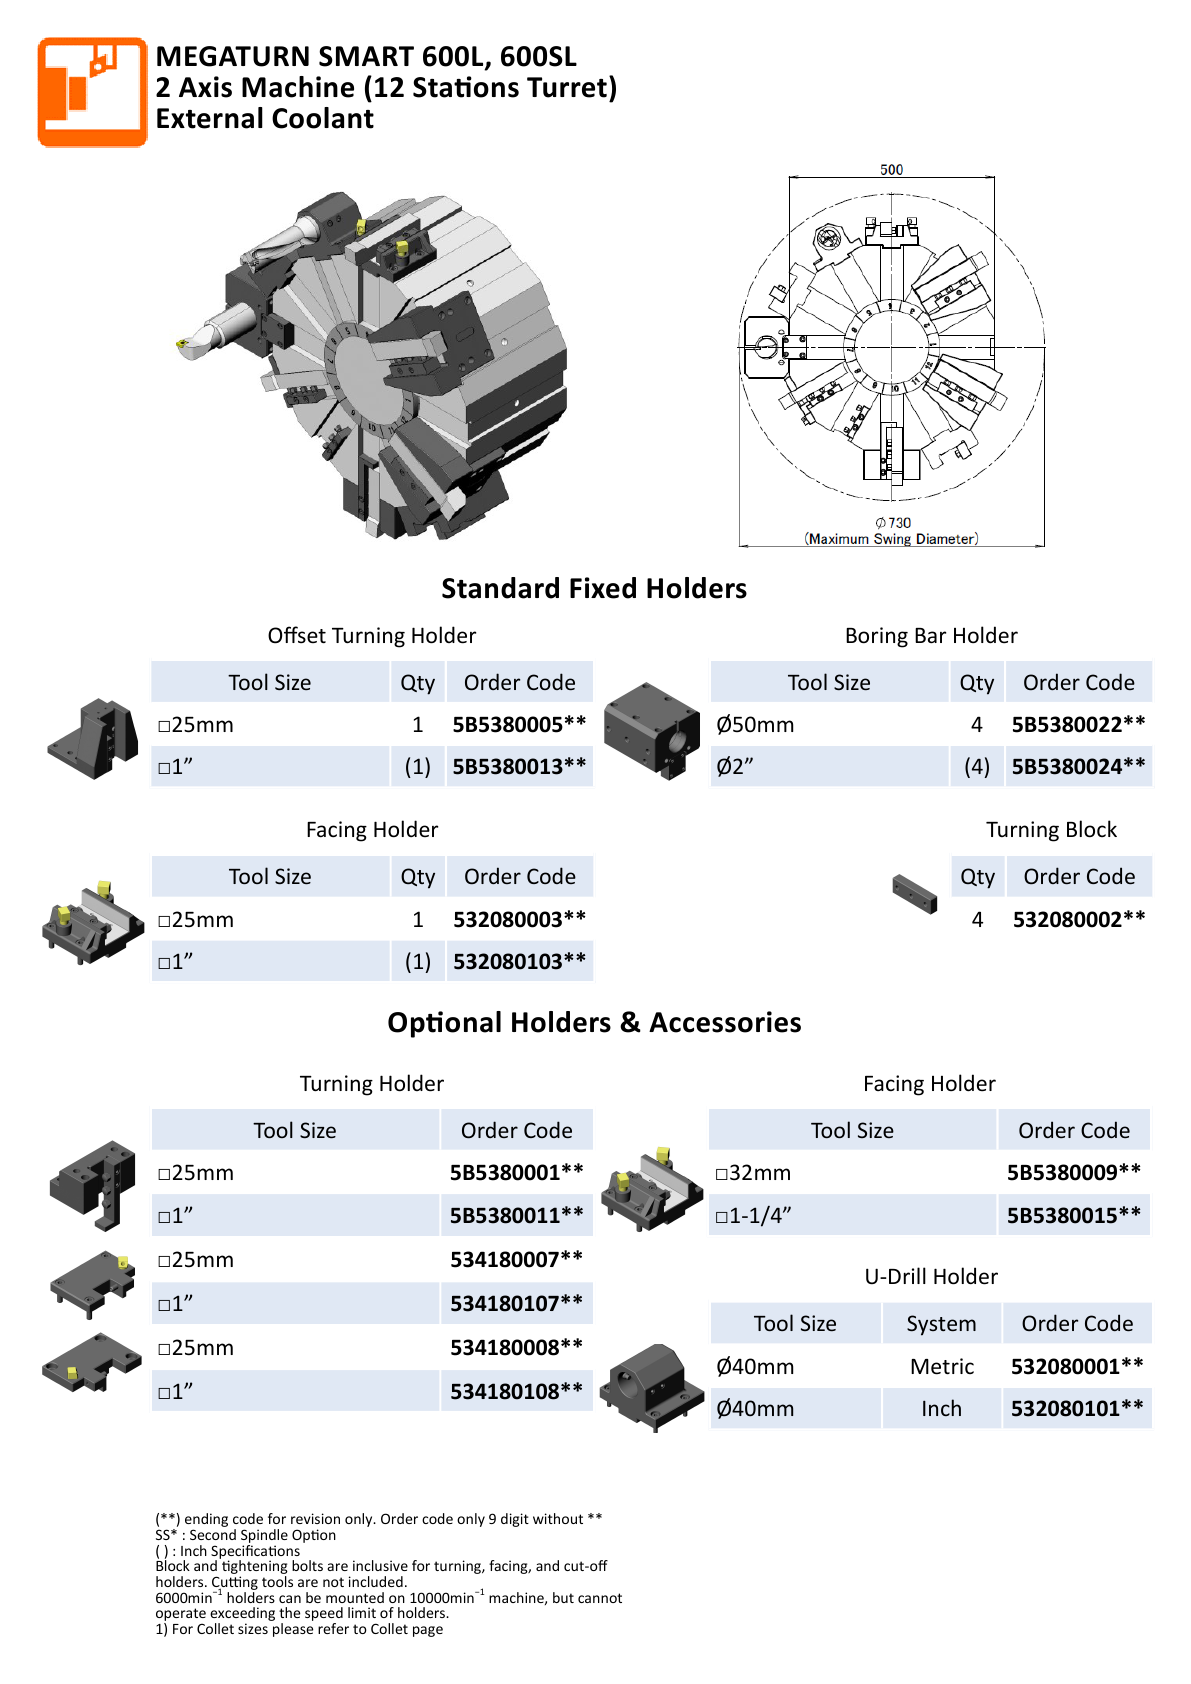 Megaturn Smart 600 Block Diagram Of Vehicle Share